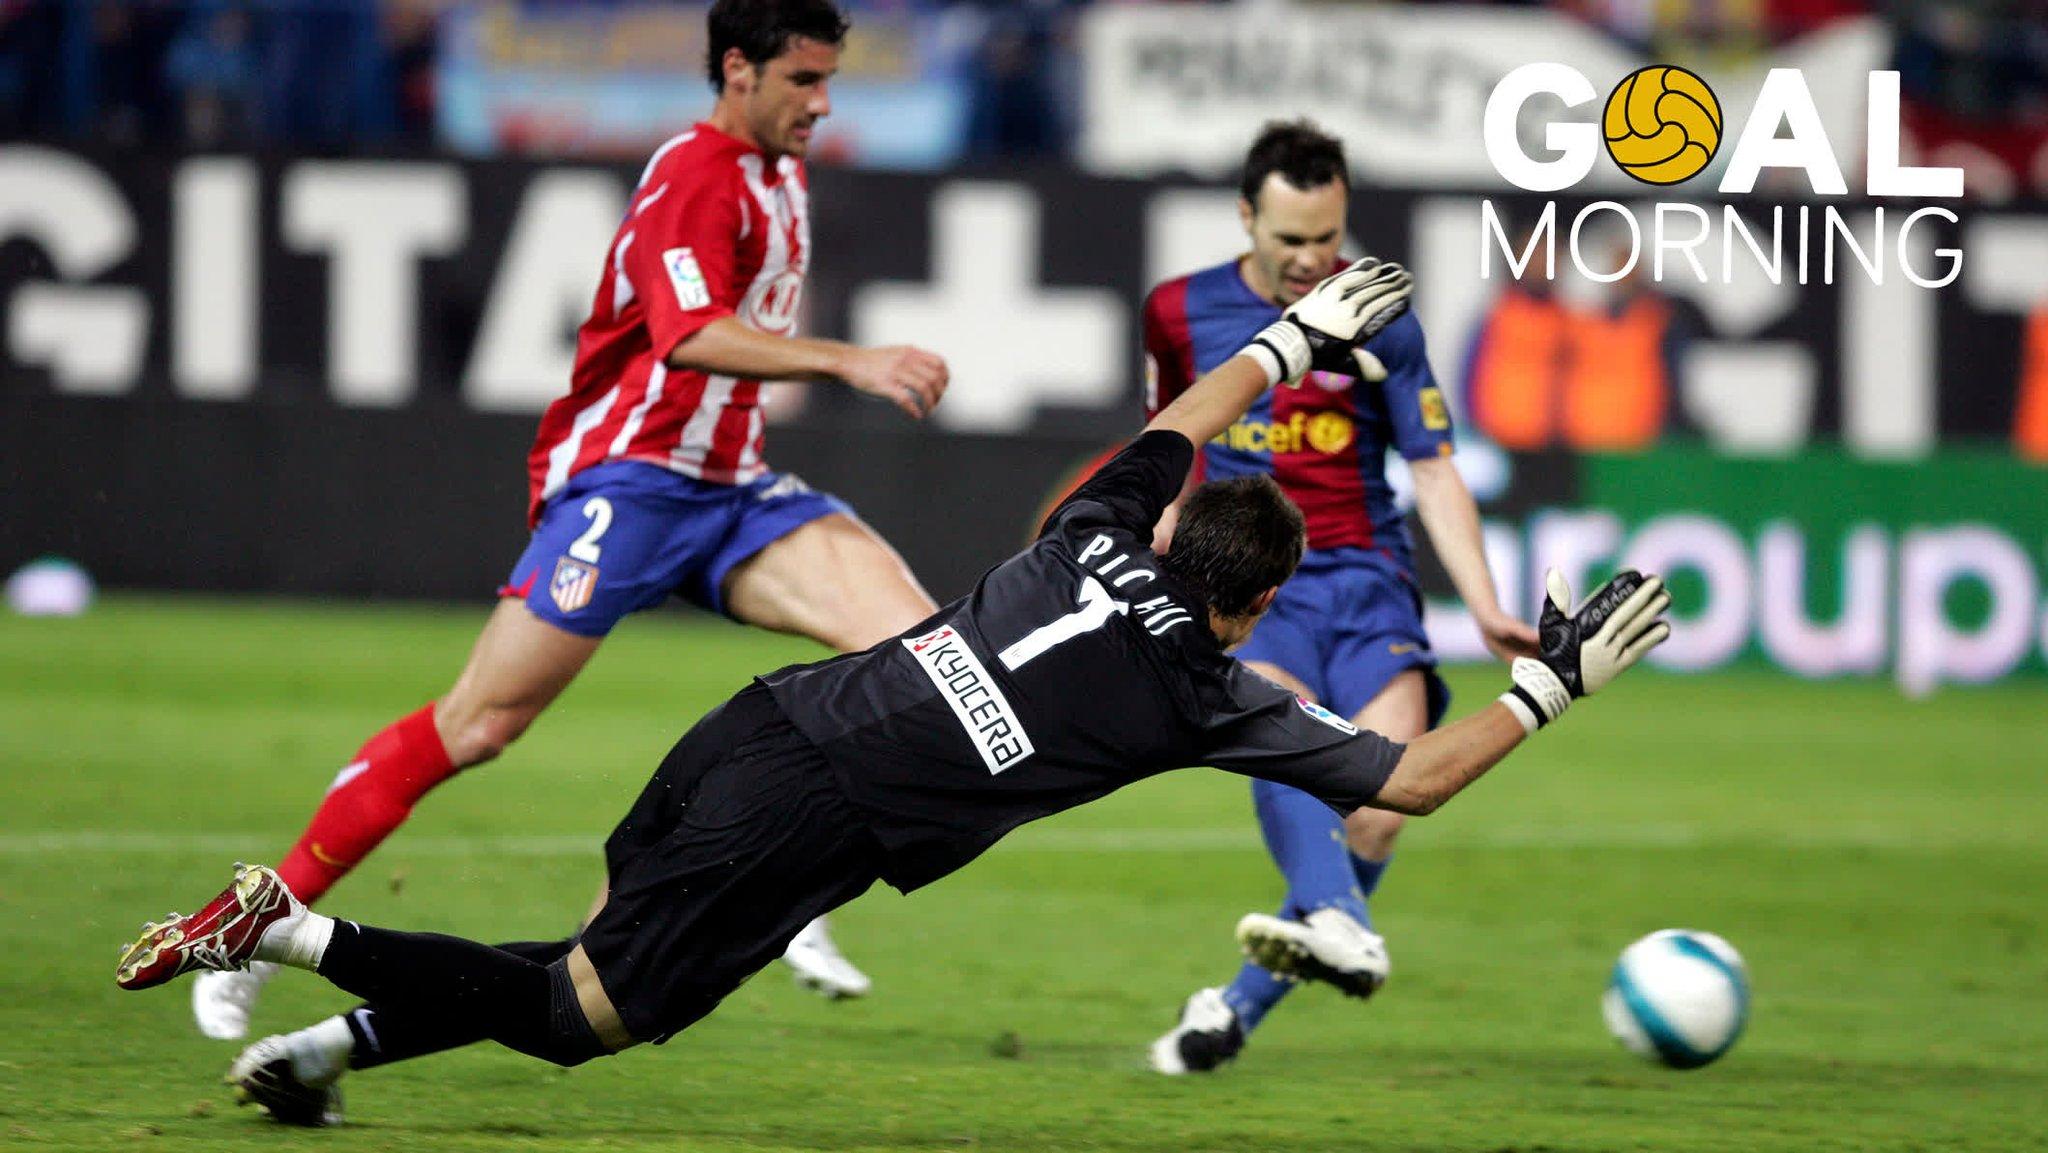 G⚽️AL MORNING!!!  2 days to go for #AtletiBarça  ⚽️ @andresiniesta8 �� Atlético Madrid https://t.co/OPjd5warUw